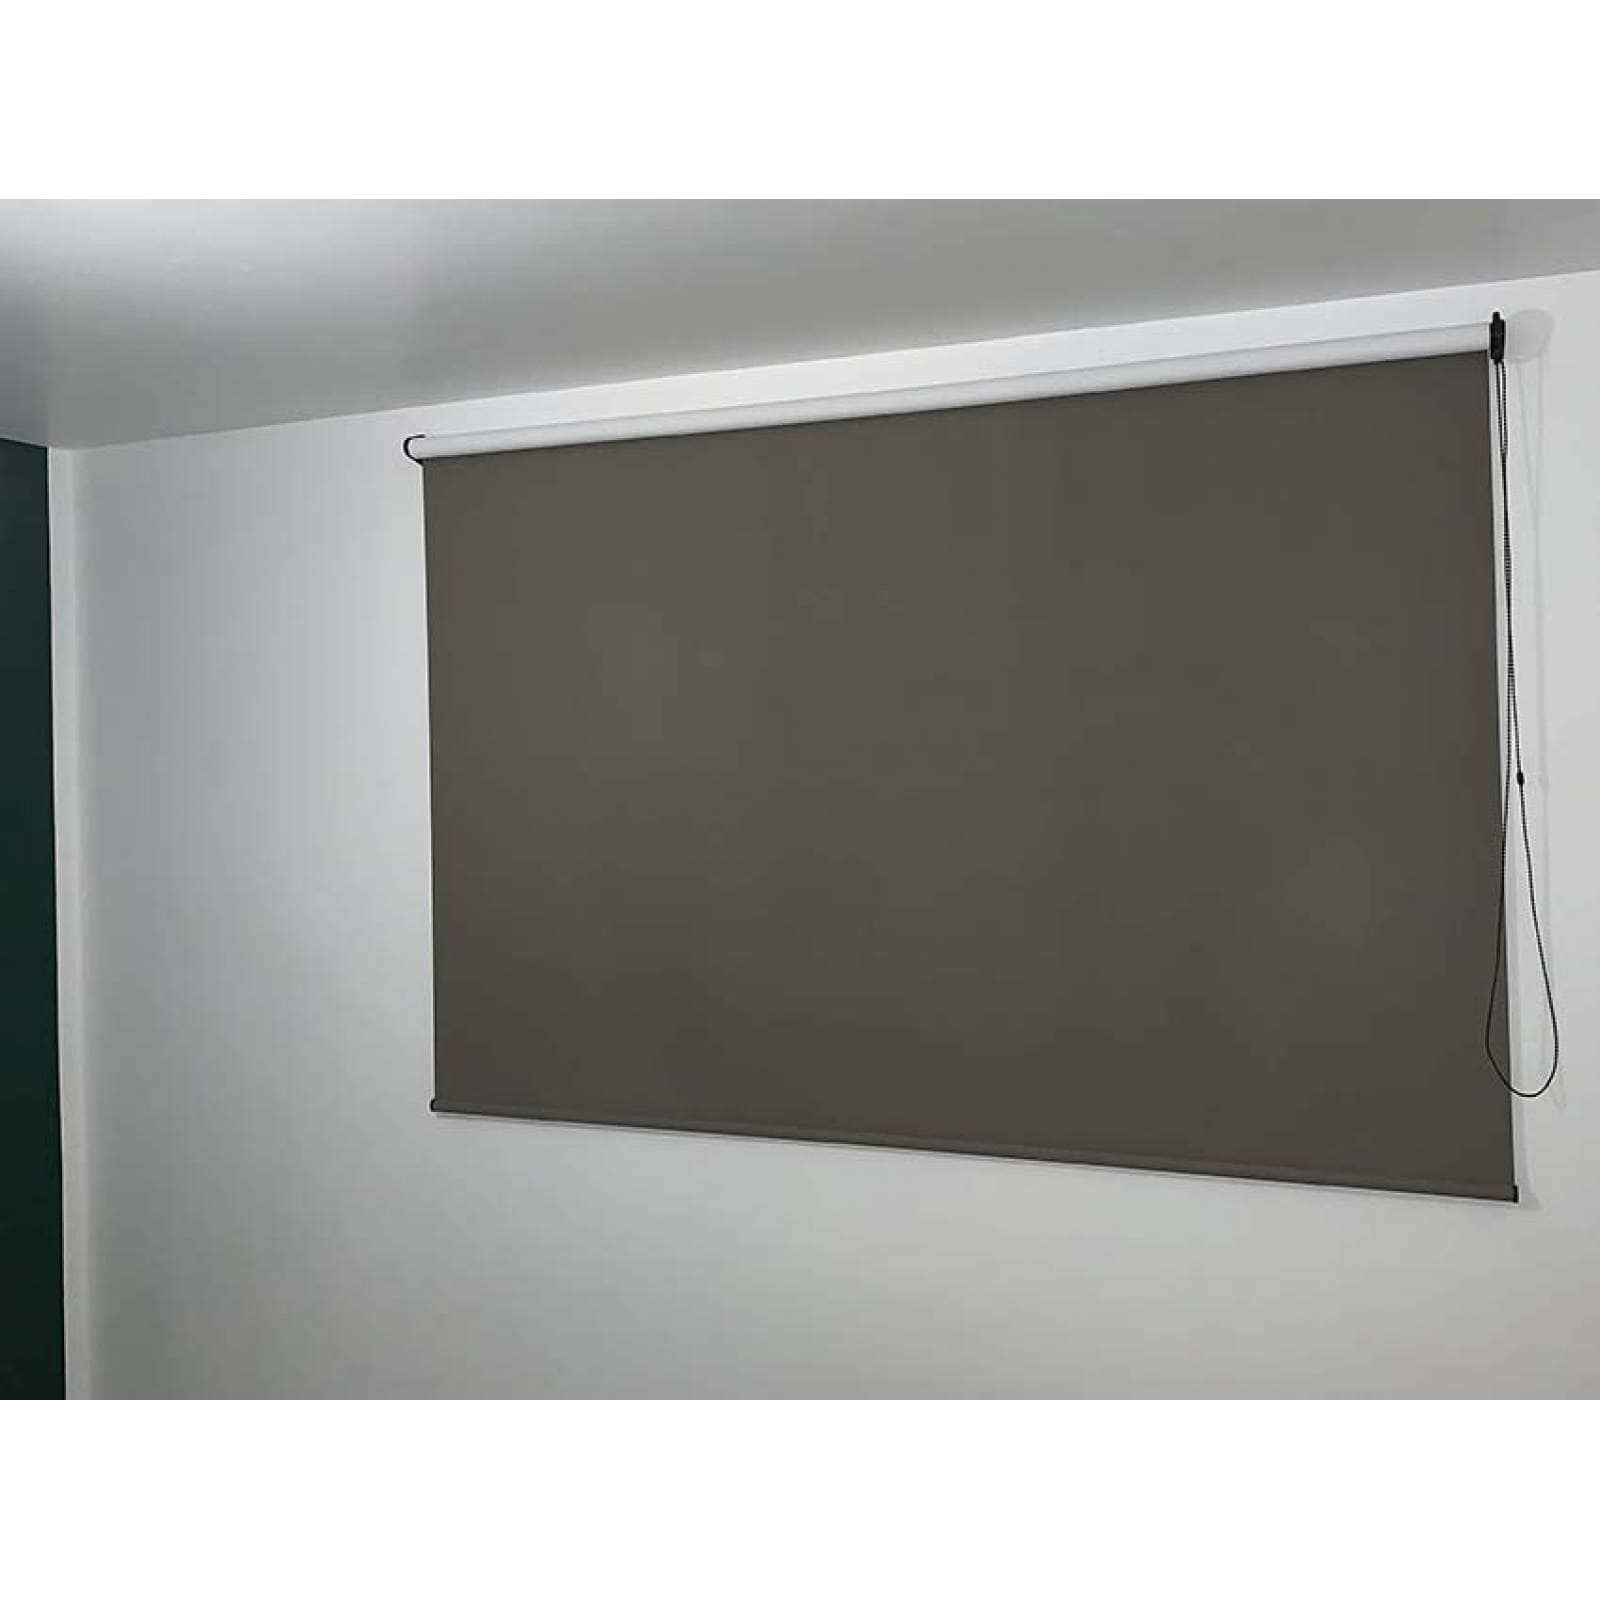 Persianas Blackout modelo 500 150 cm de ancho X hasta 230 cm de largo